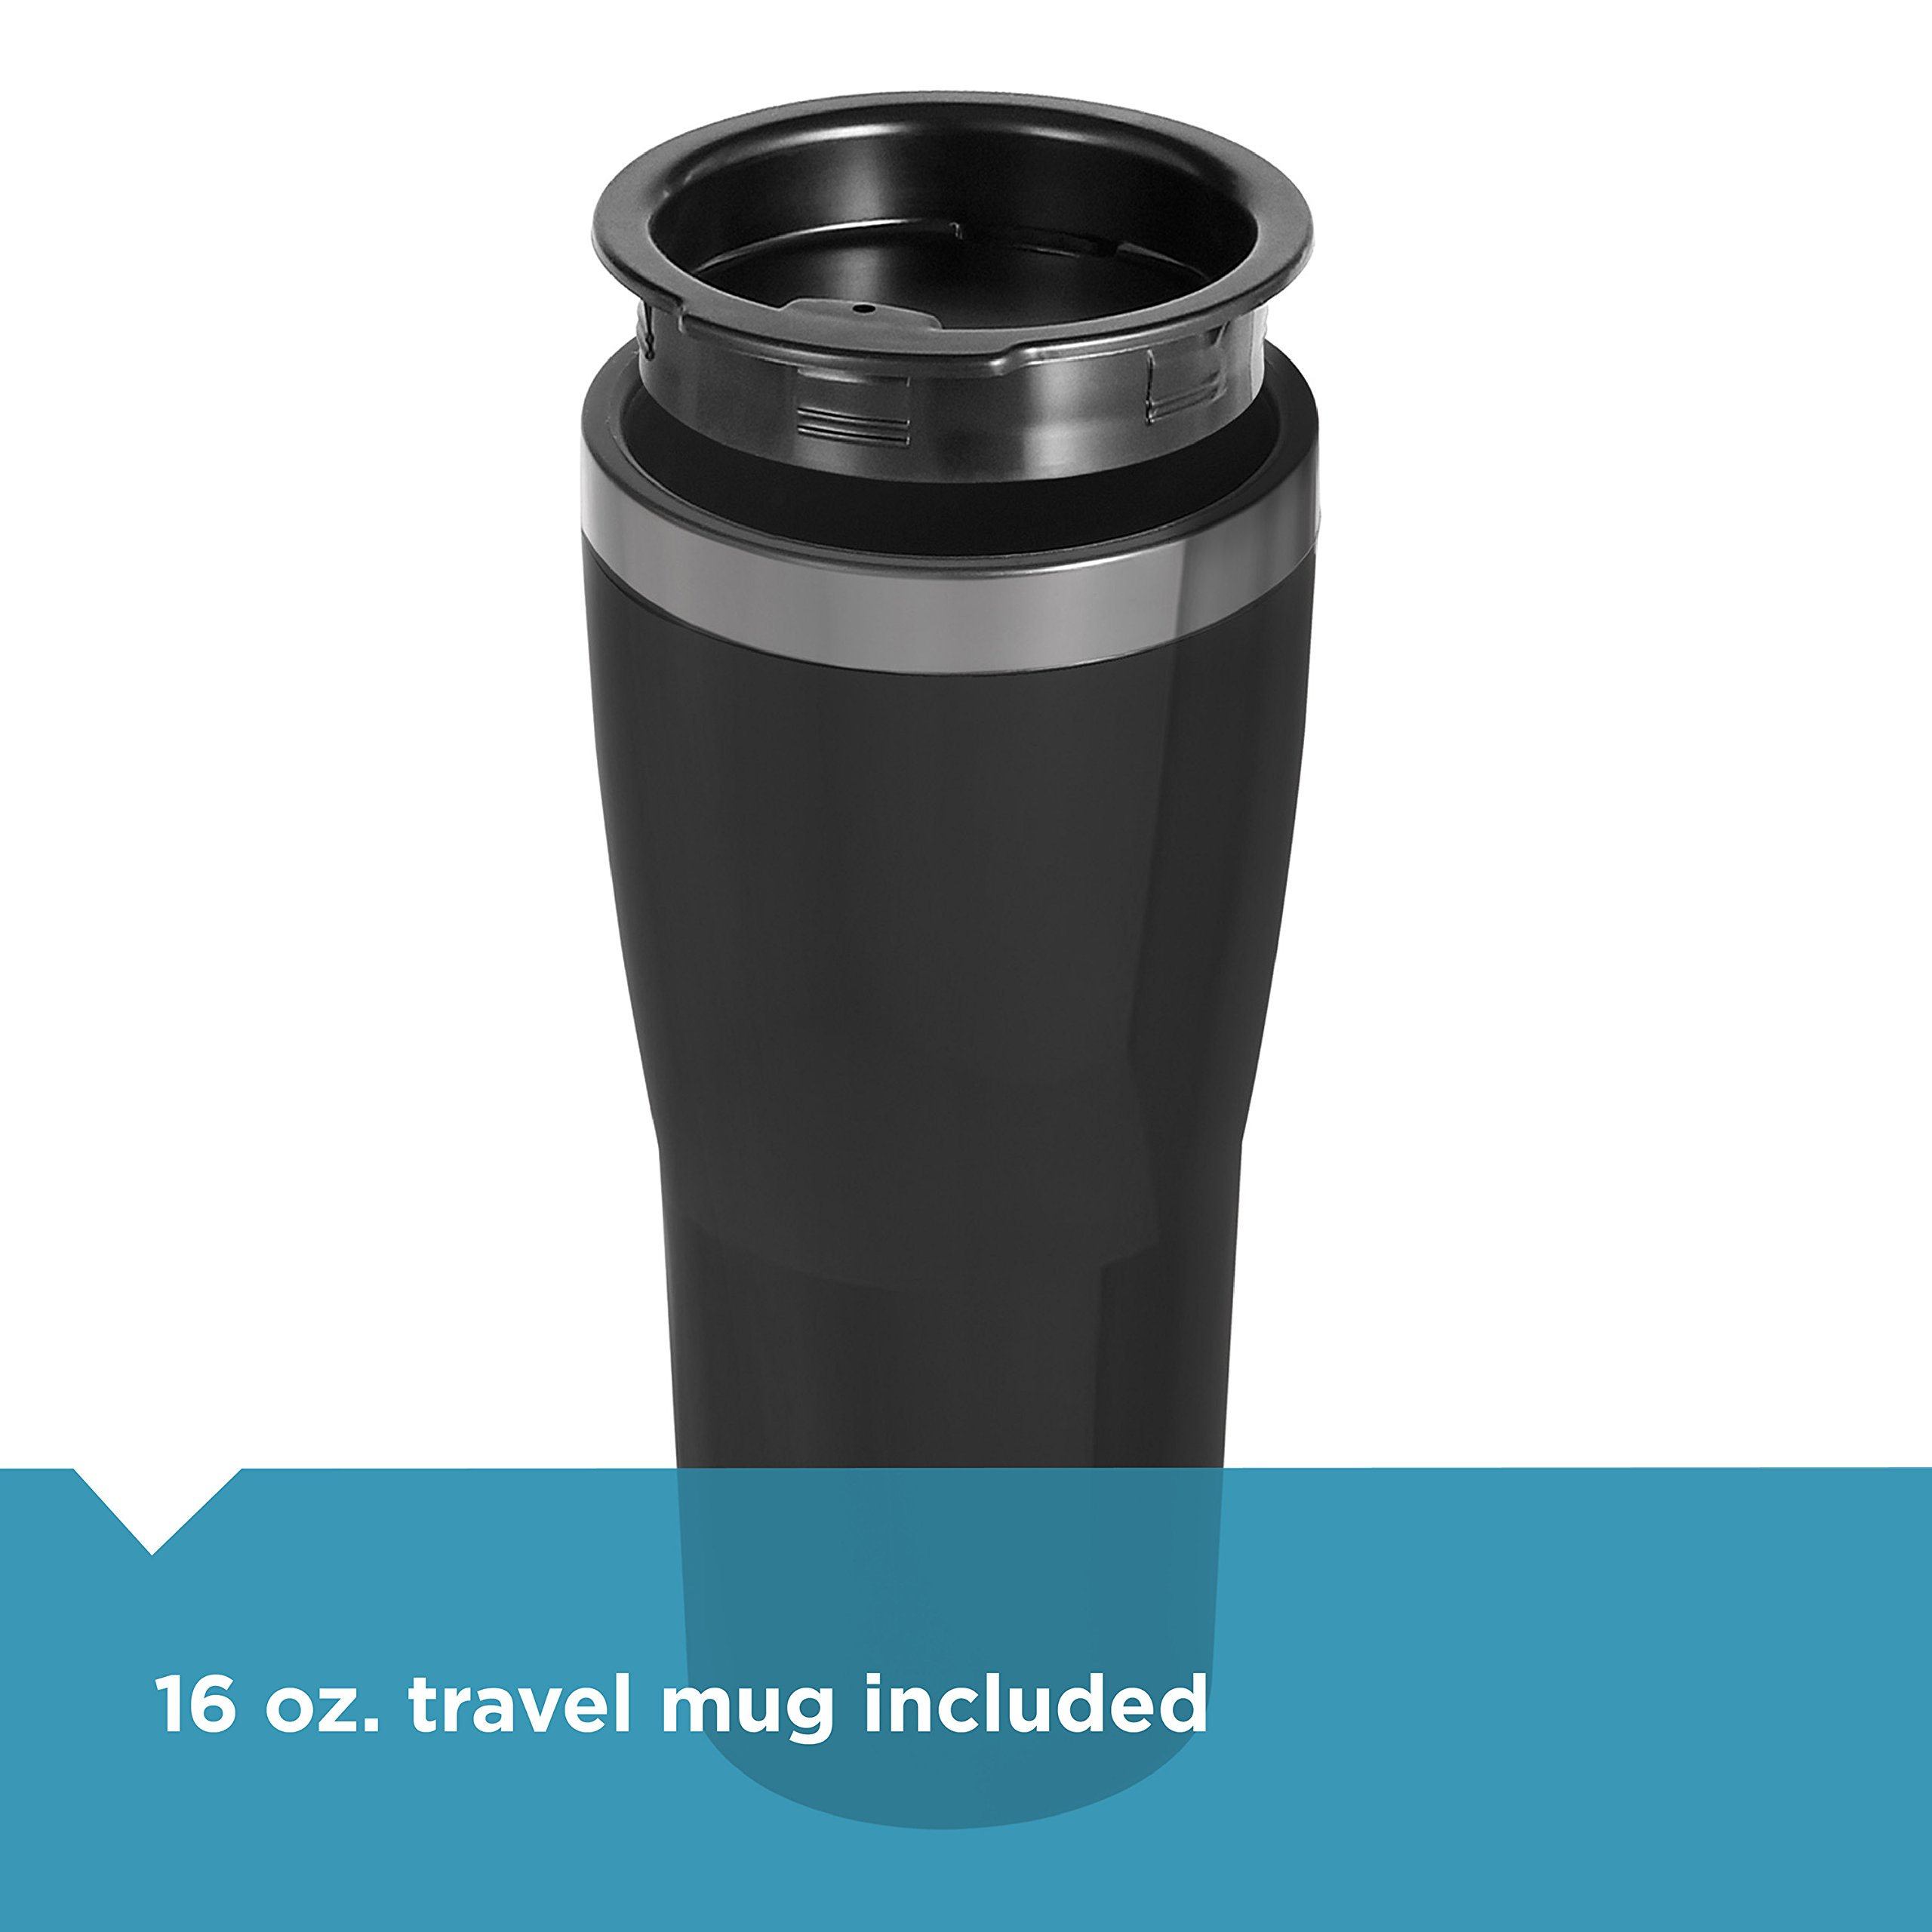 BLACK+DECKER Single Serve Coffeemaker, Black, CM618 by BLACK+DECKER (Image #6)